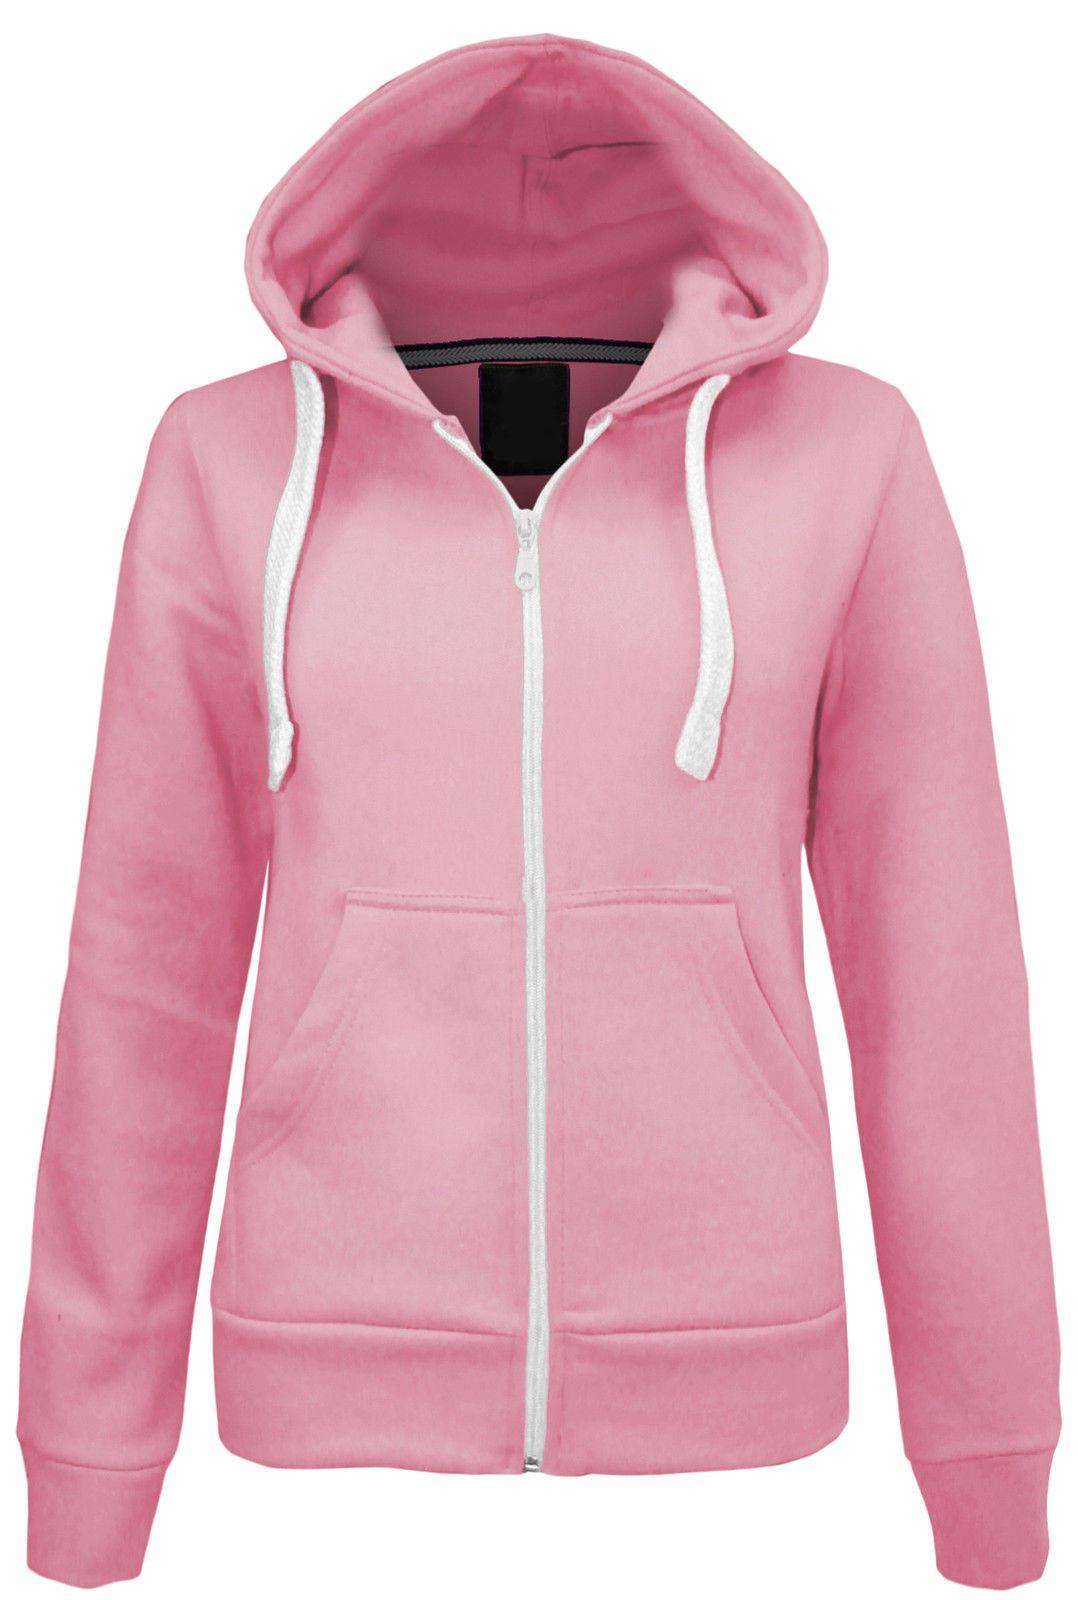 Womens Plain Colour Fleece Malaika Hoodie zipper Hood Plus Size ...